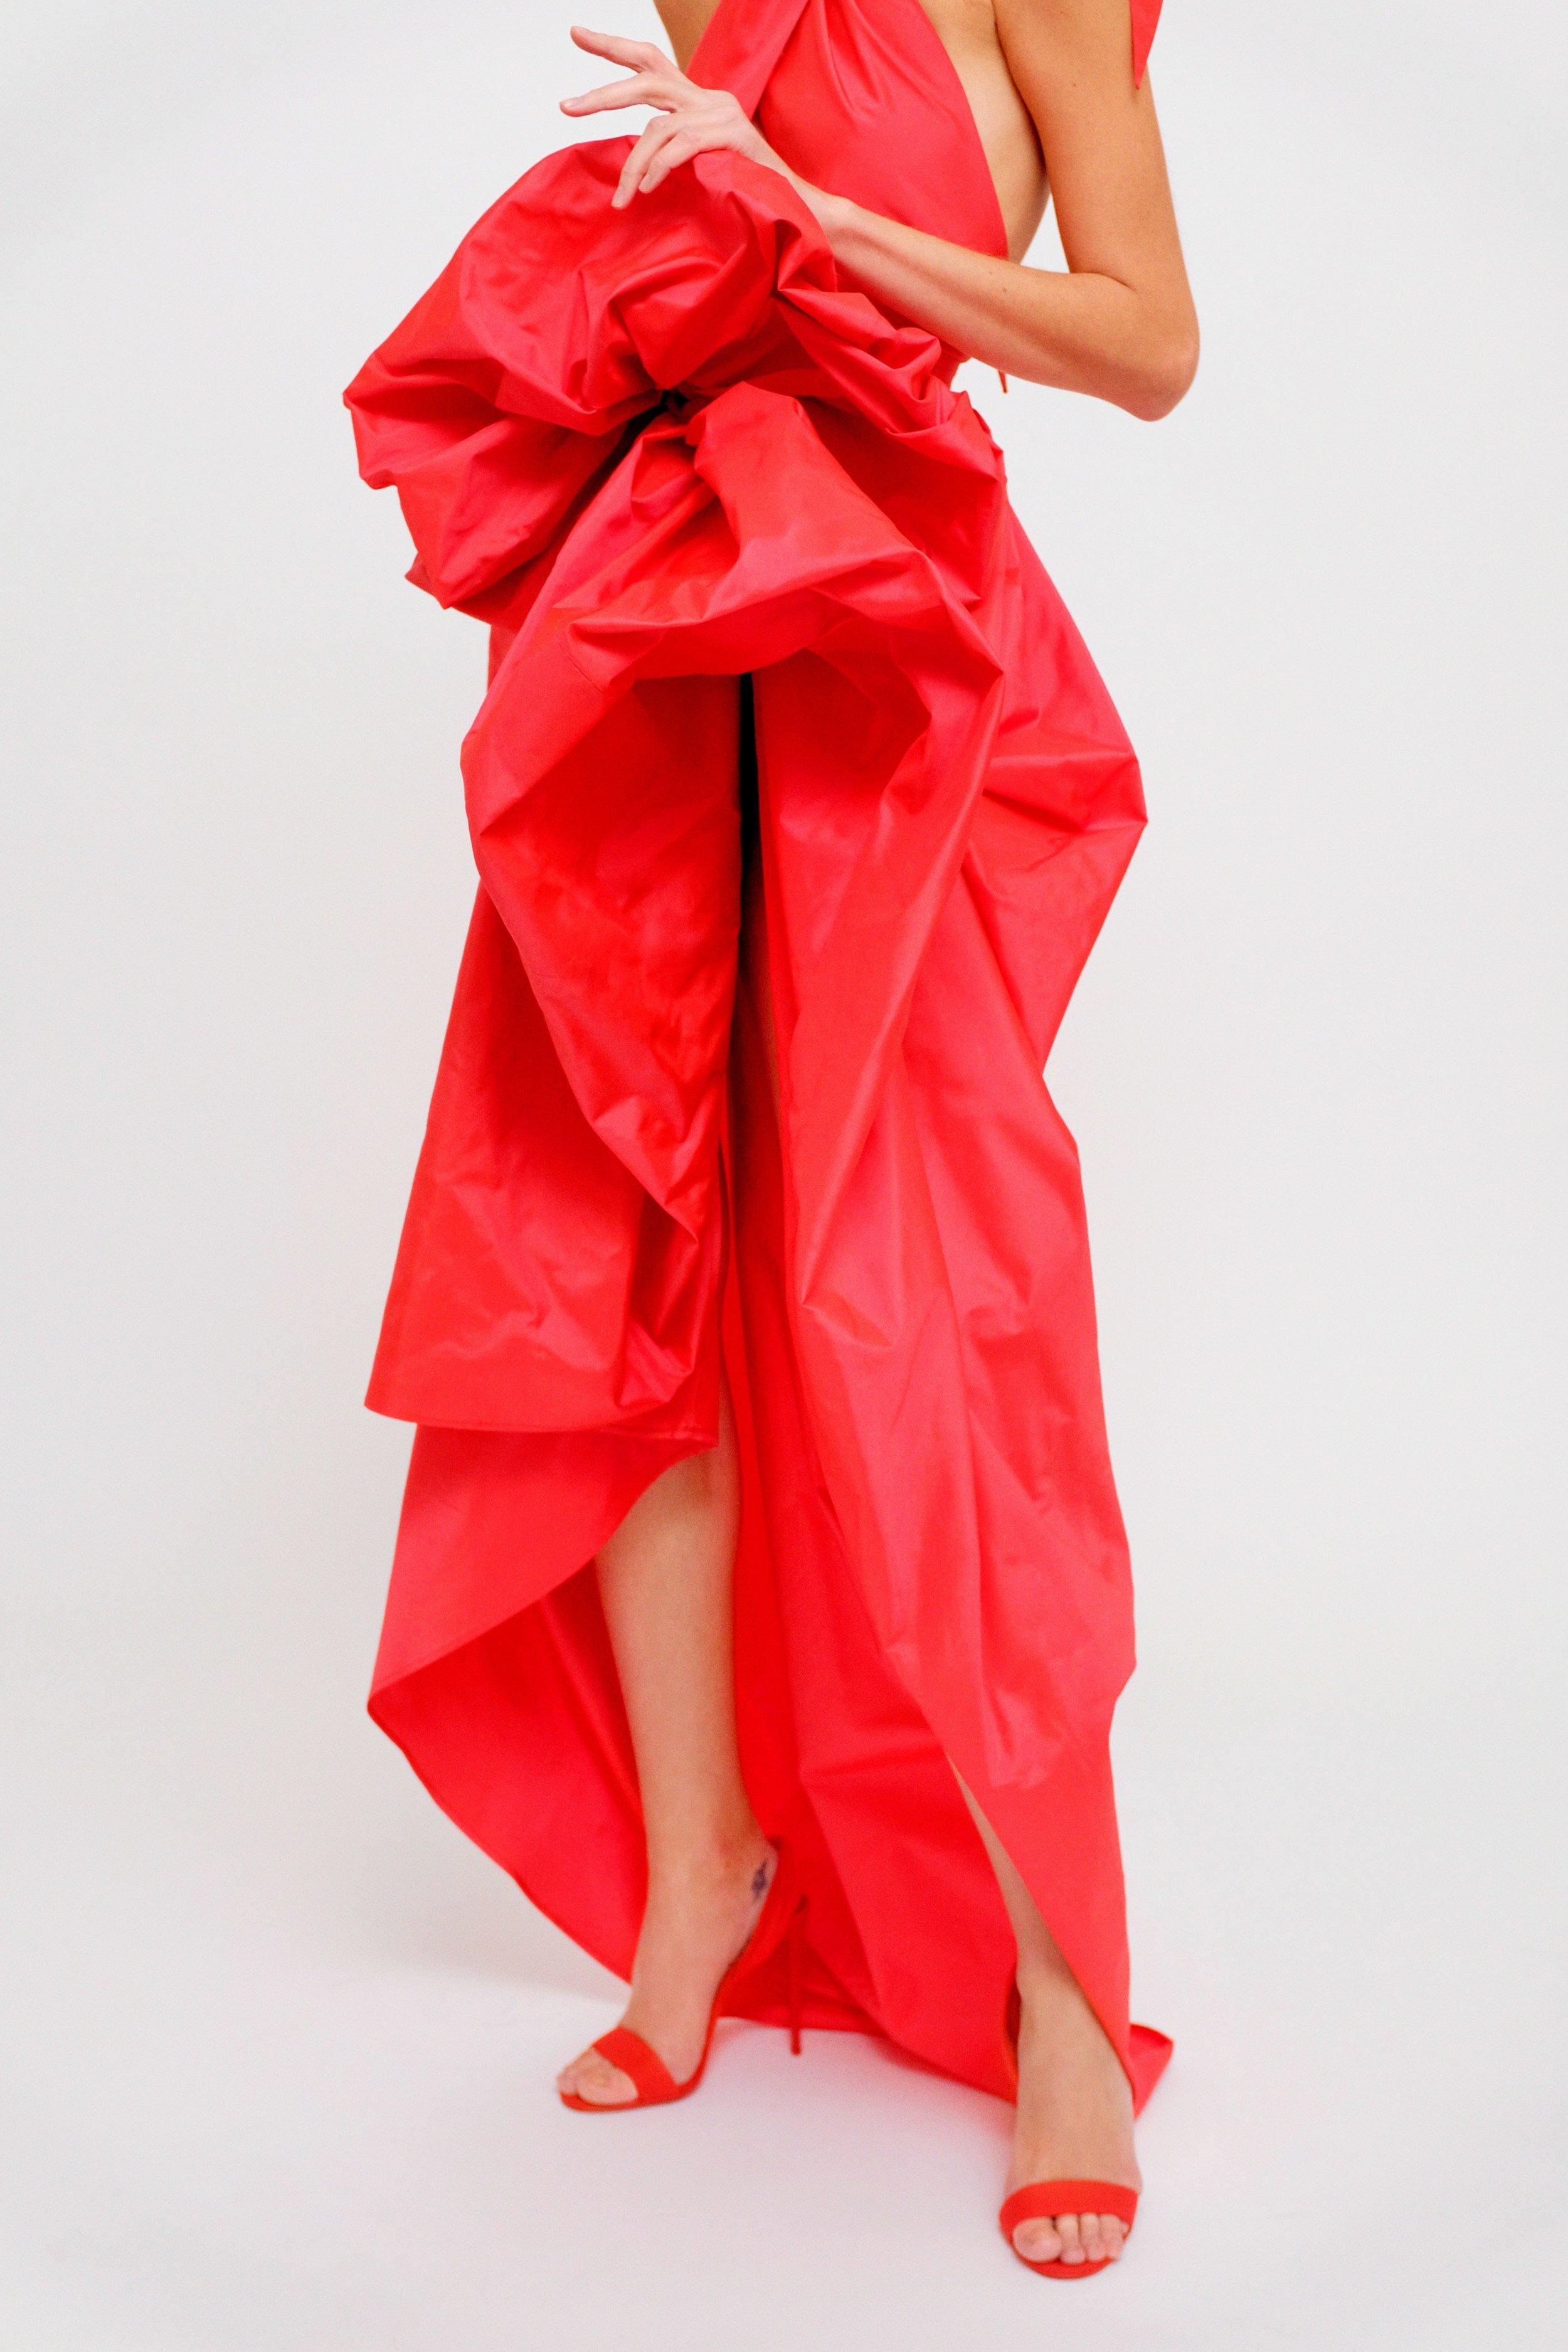 00021-martin-grant-spring-2019-ready-to-wear-credit-daniel-roché.jpg